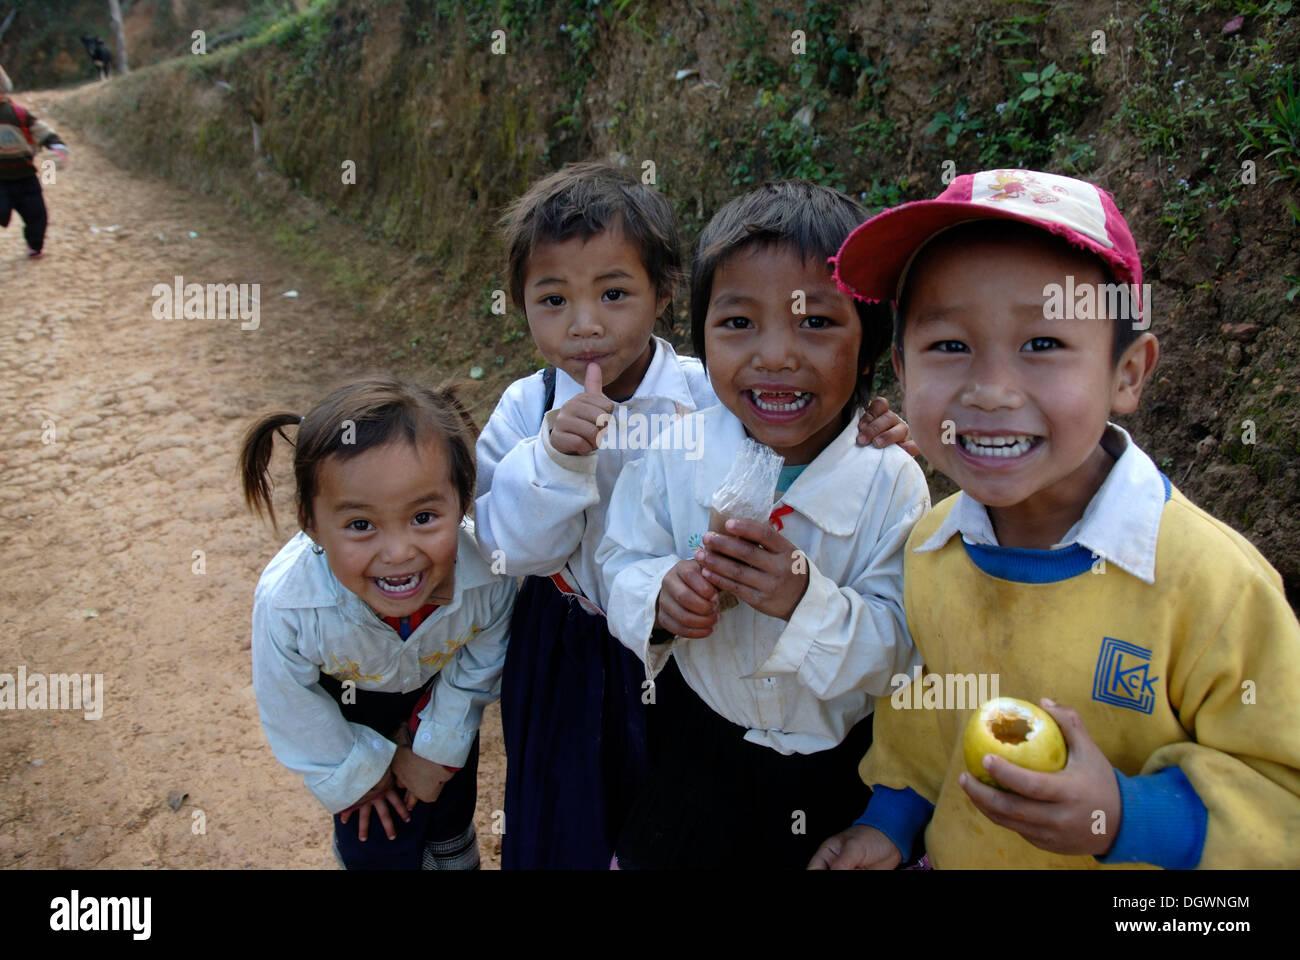 Children, poverty, gang of grinning children having fun, village of Ban Komaen, Phongsali district and province, Laos - Stock Image